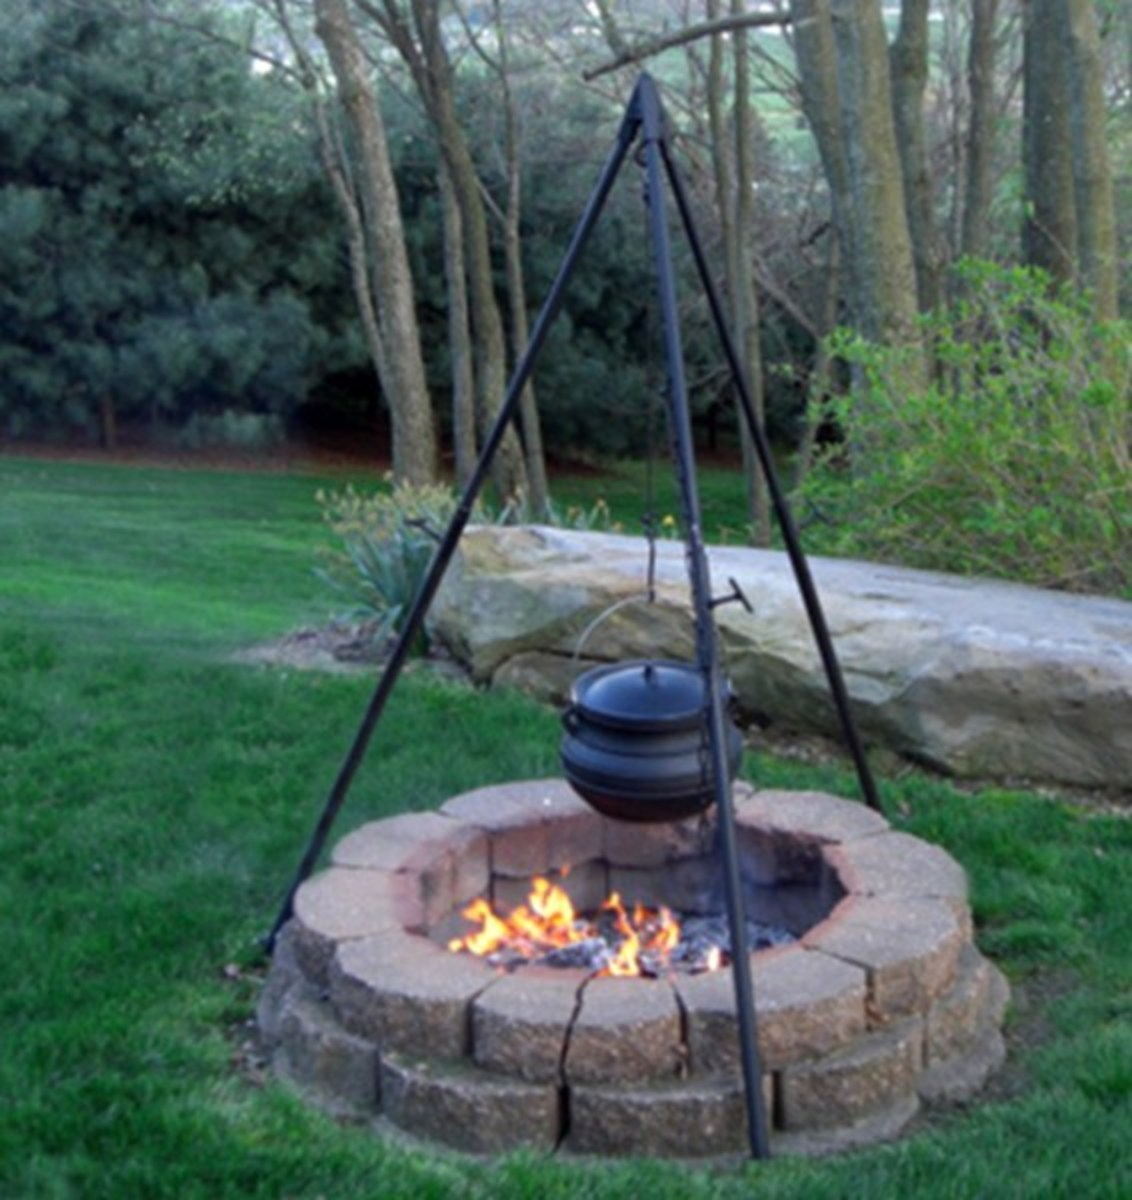 Professional Tripod and Cast Iron Pot